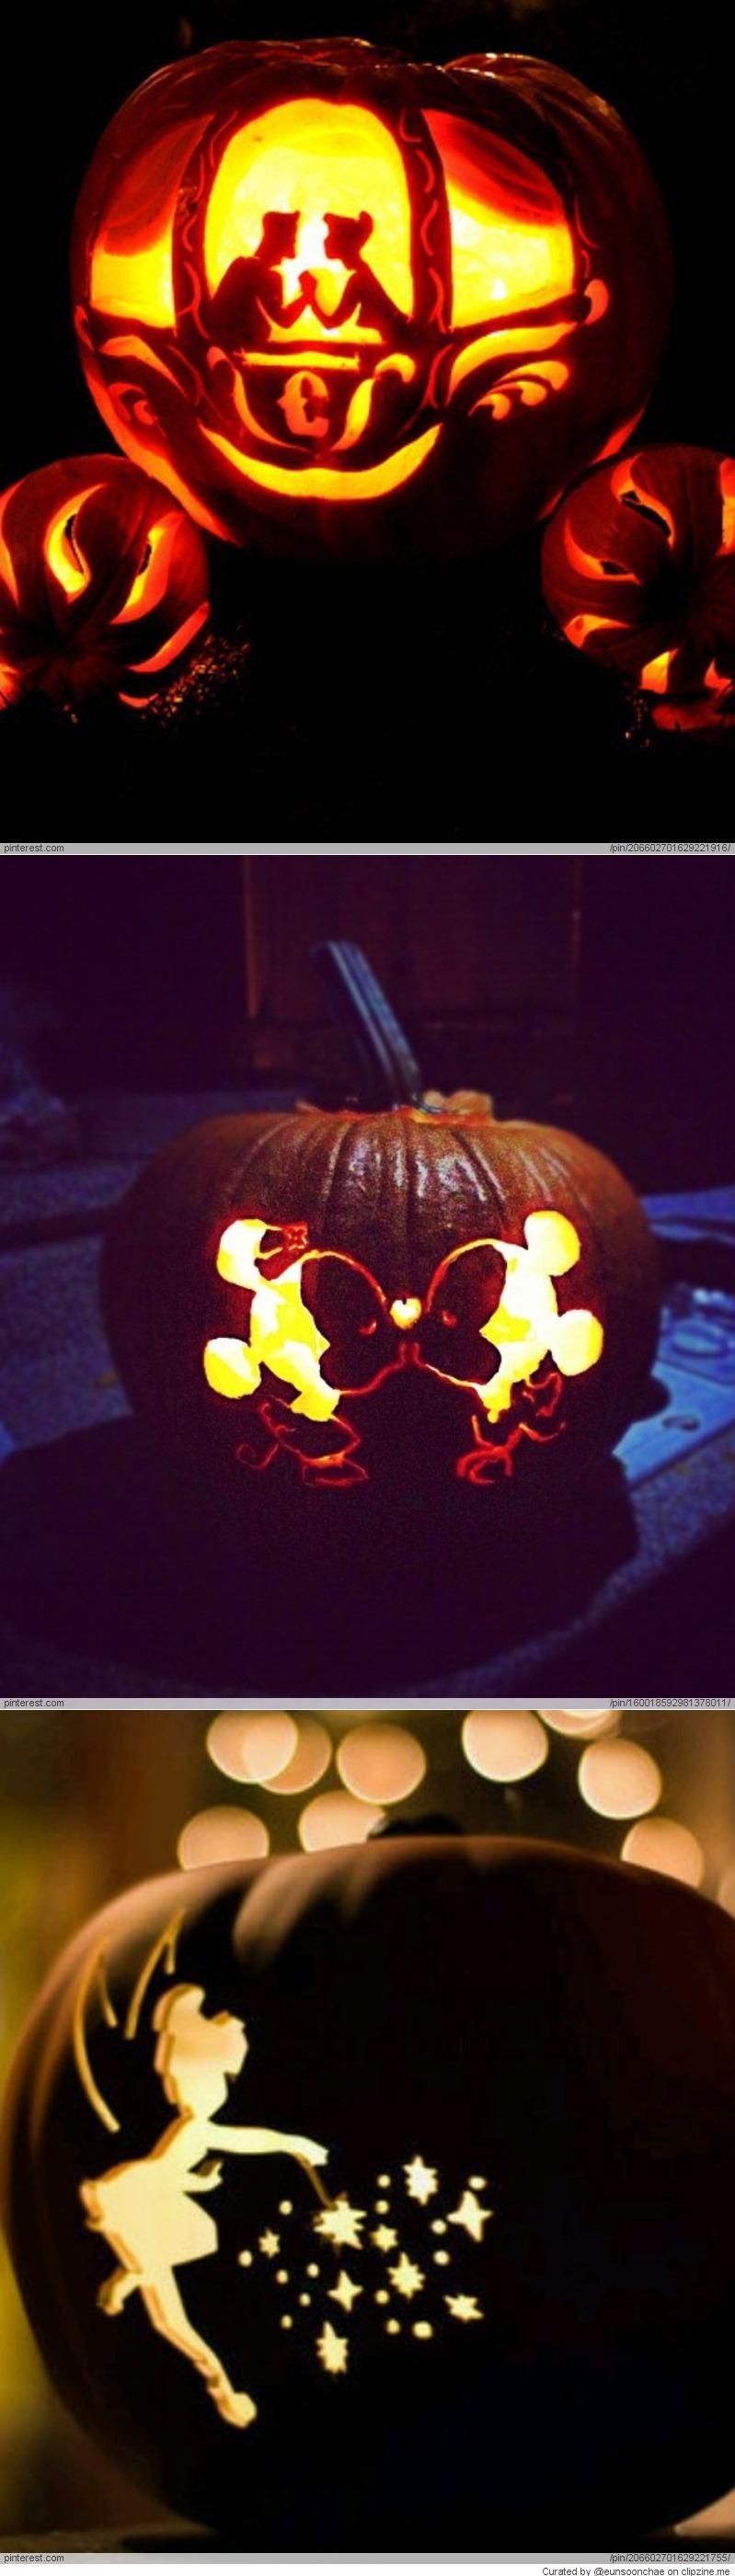 Disney Pumpkin Carving Ideas   Halloween!!!!!!   Pinterest   Disney ...